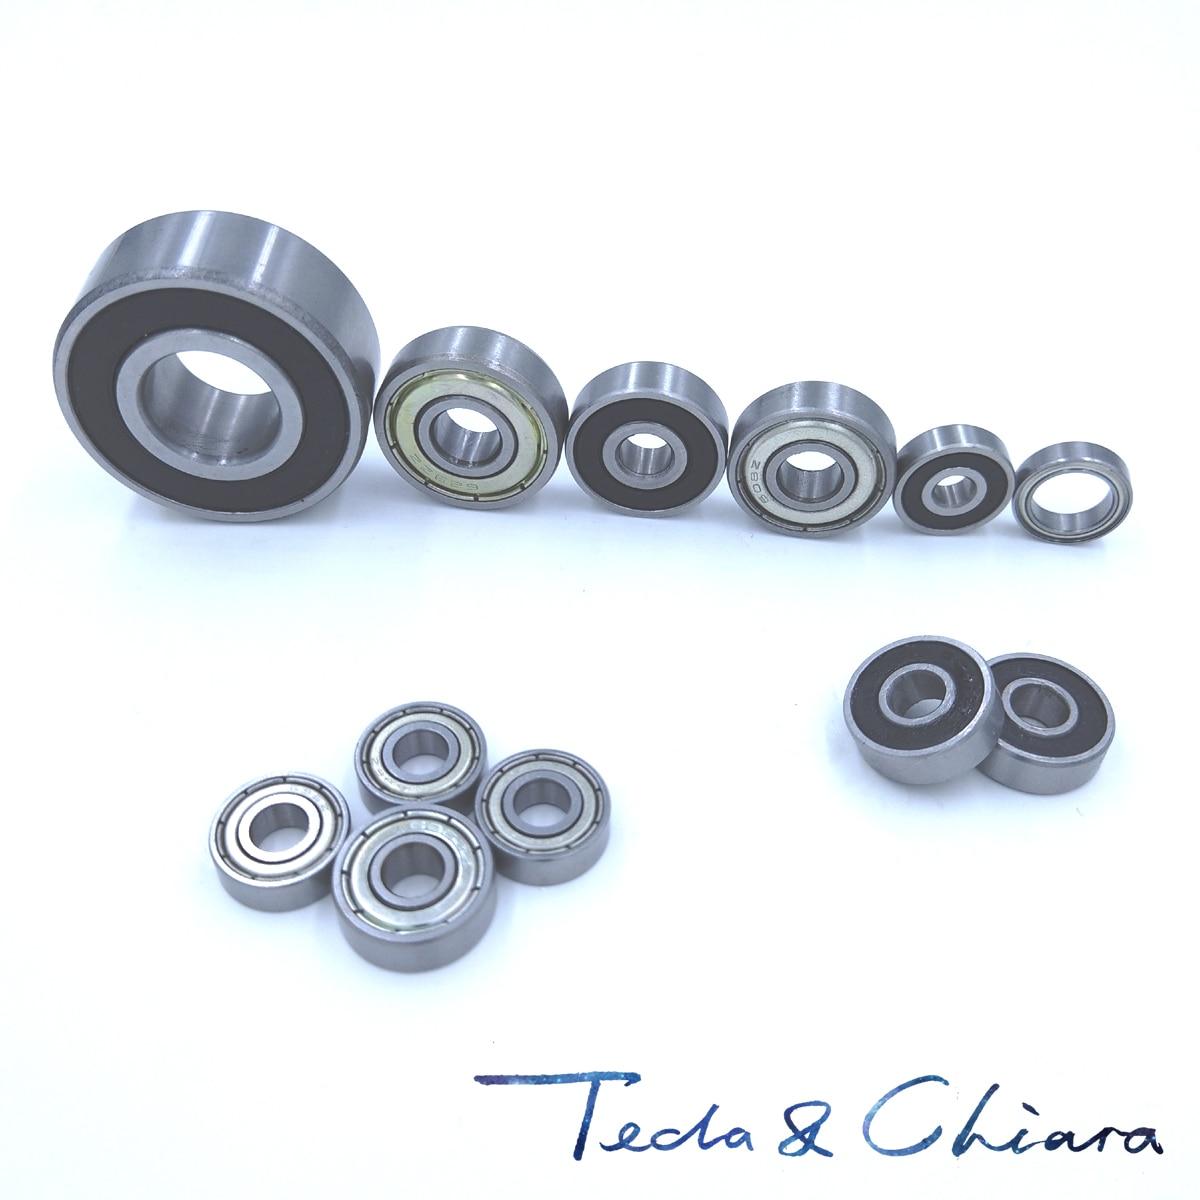 636 636ZZ 636RS 636-2Z 636Z 636-2RS ZZ RS RZ 2RZ Deep Groove Ball Bearings 6 X 22 X 7mm